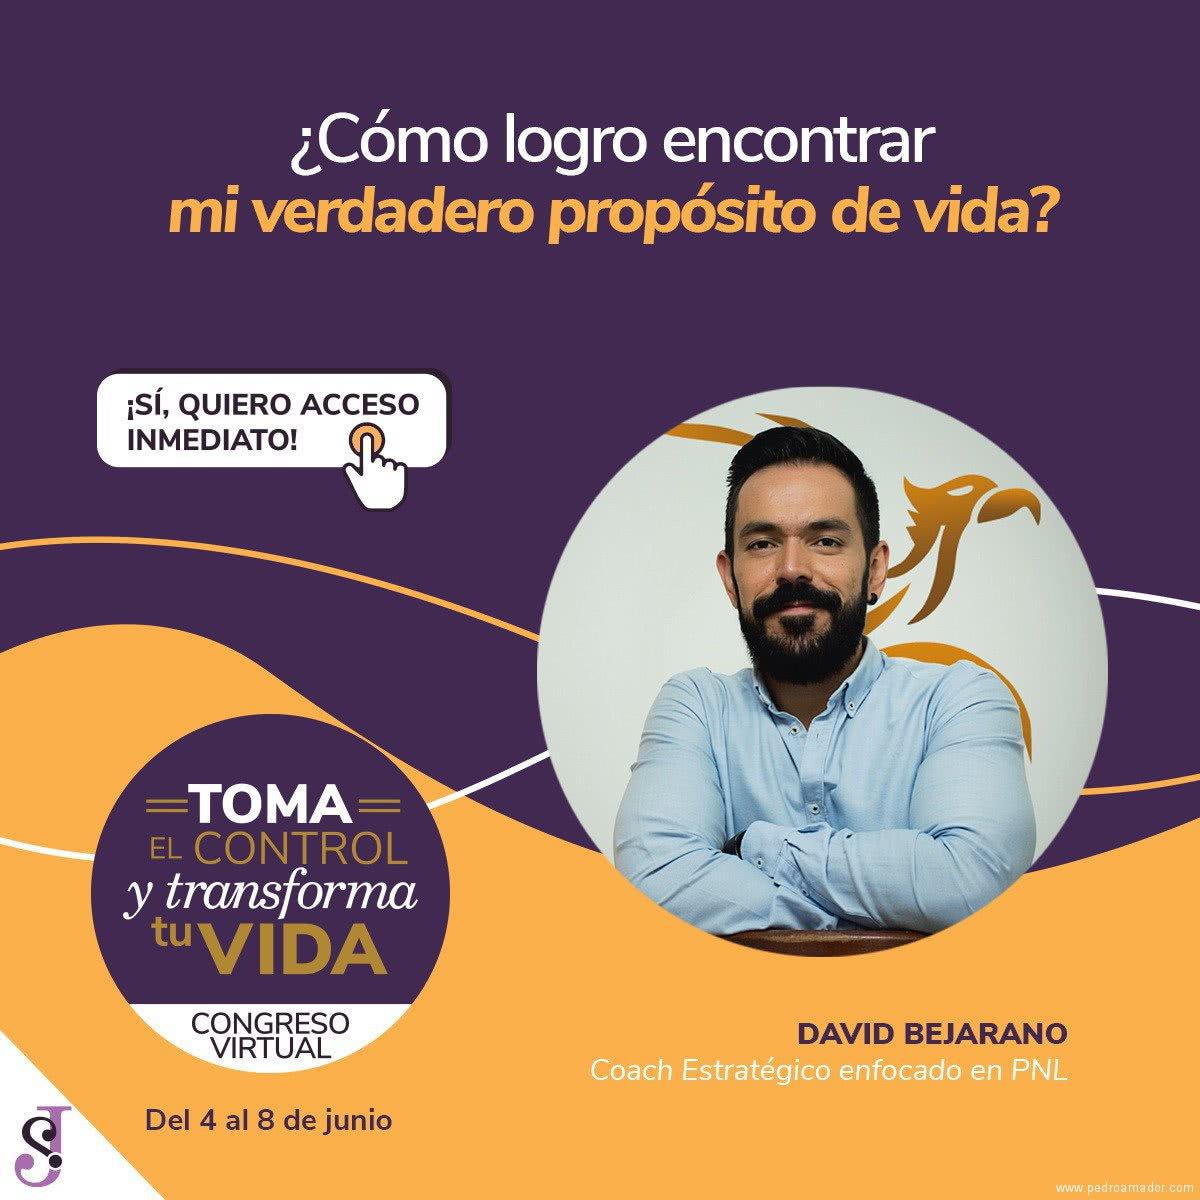 Transforma tu vida - David Bejarano